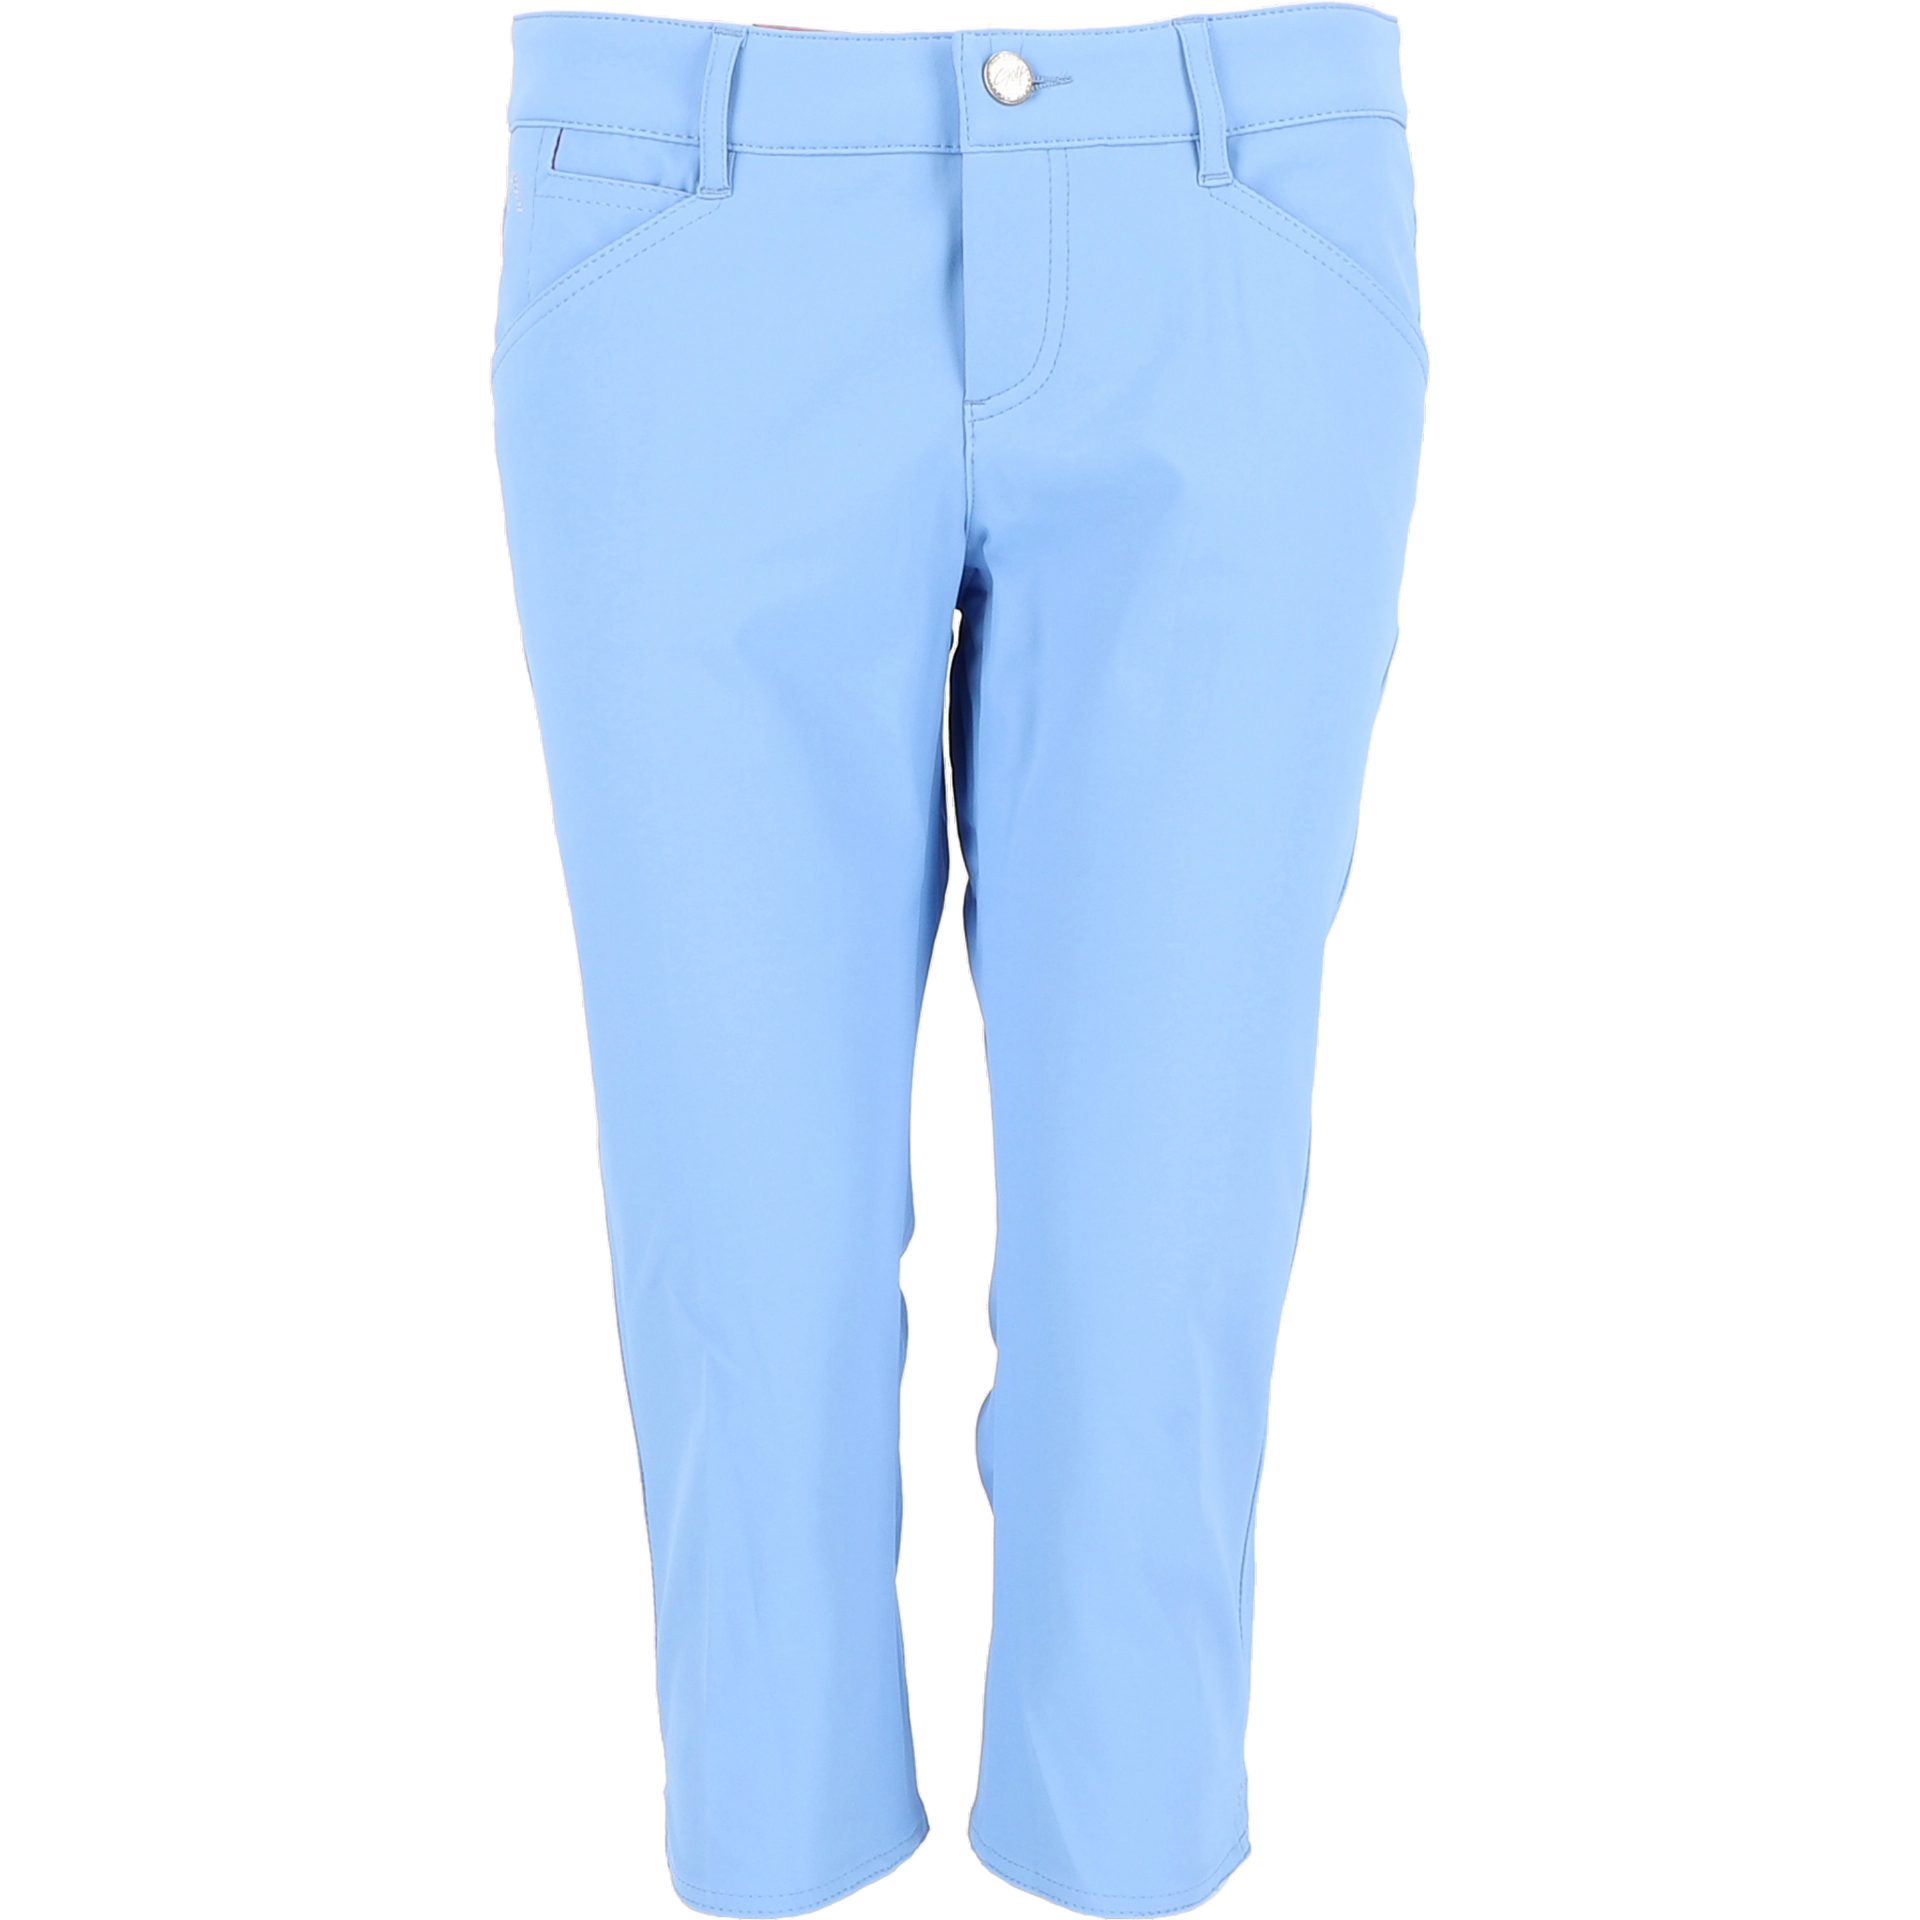 MONA-C Hose - 3xDRY Cooler, blau